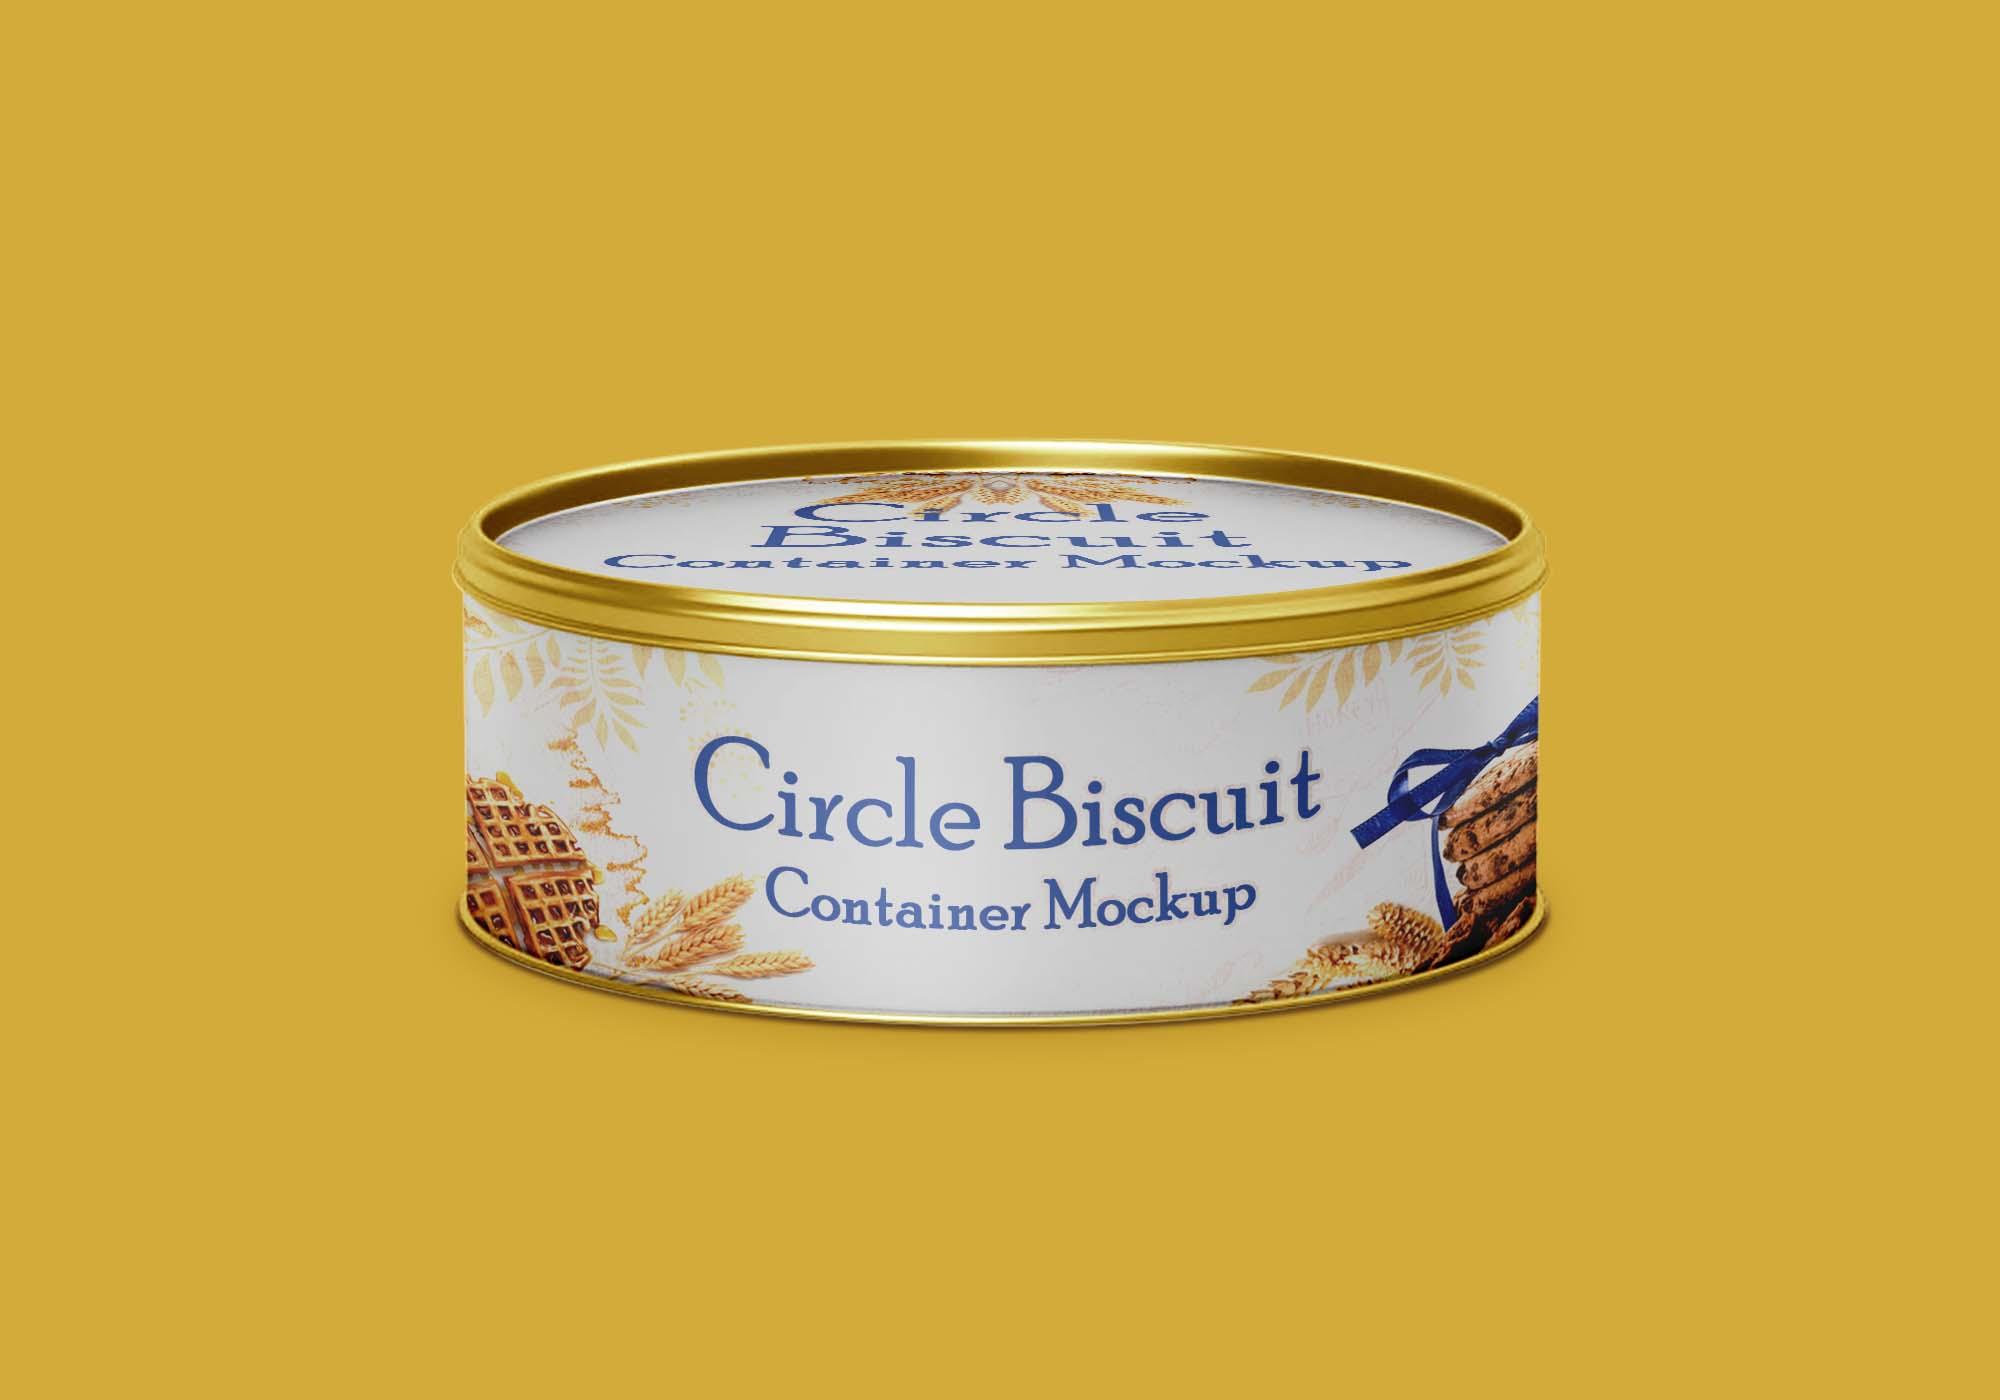 Circle Biscuit Mockup